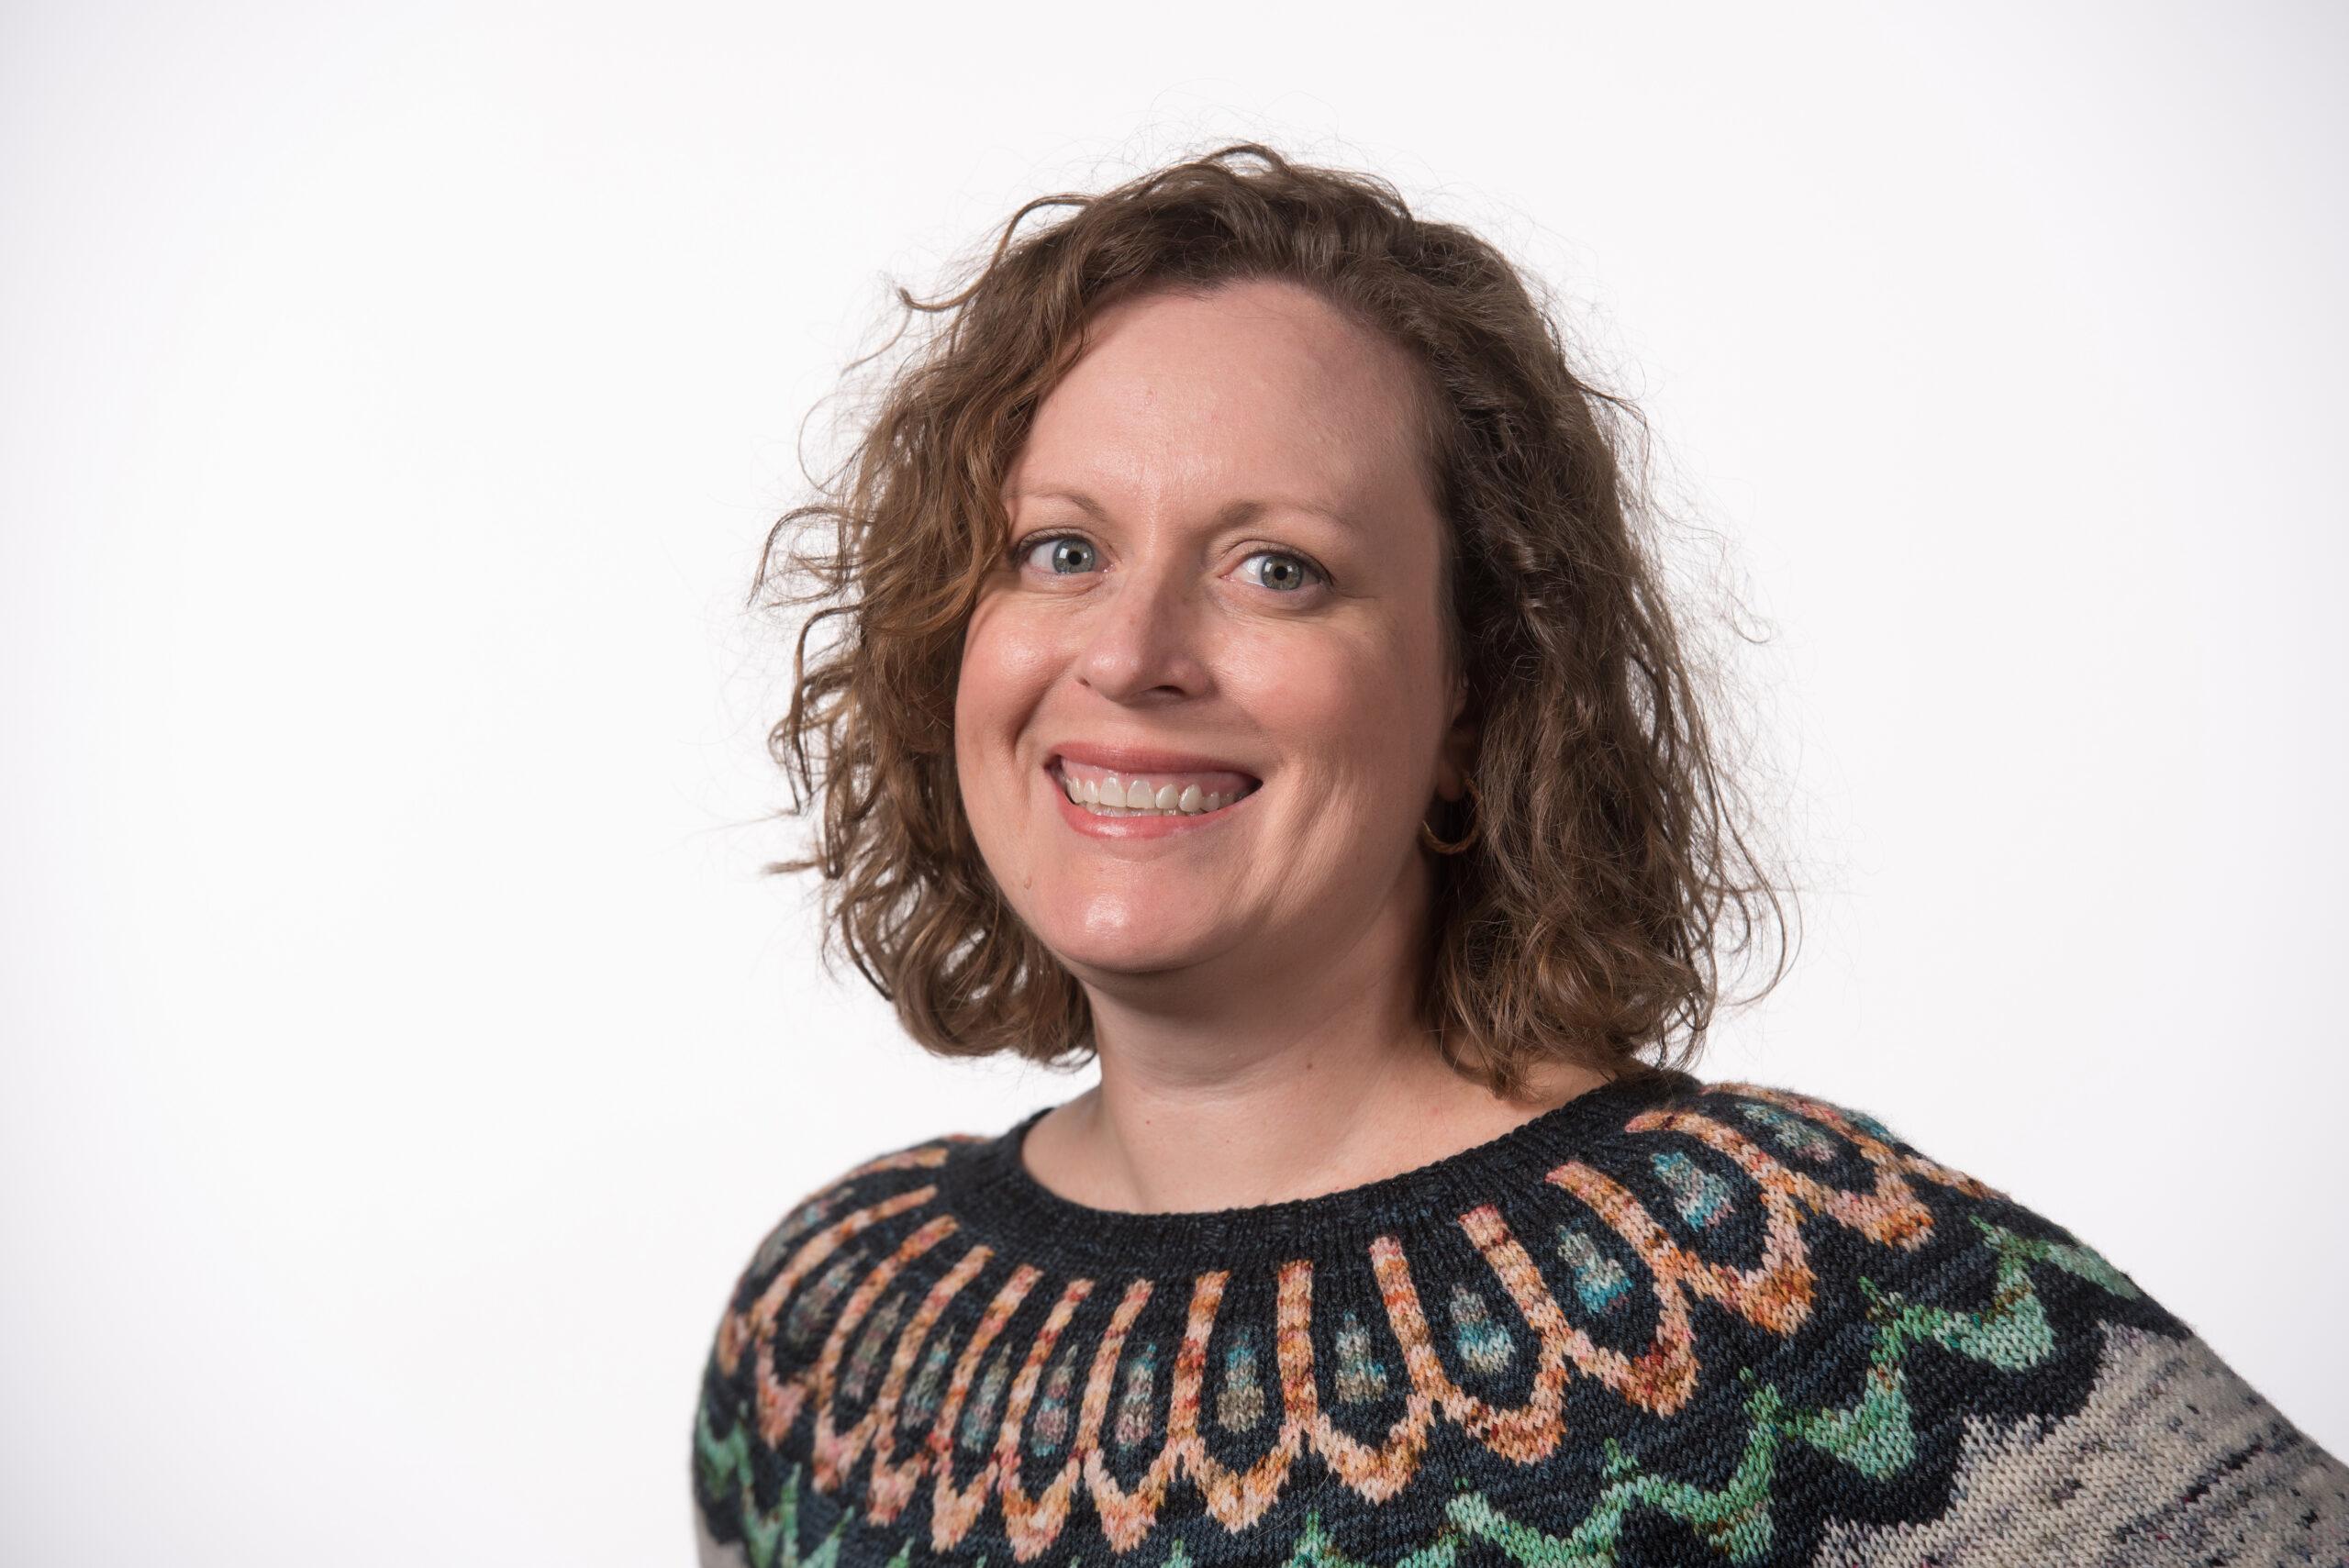 Profile image of Jody Thompson